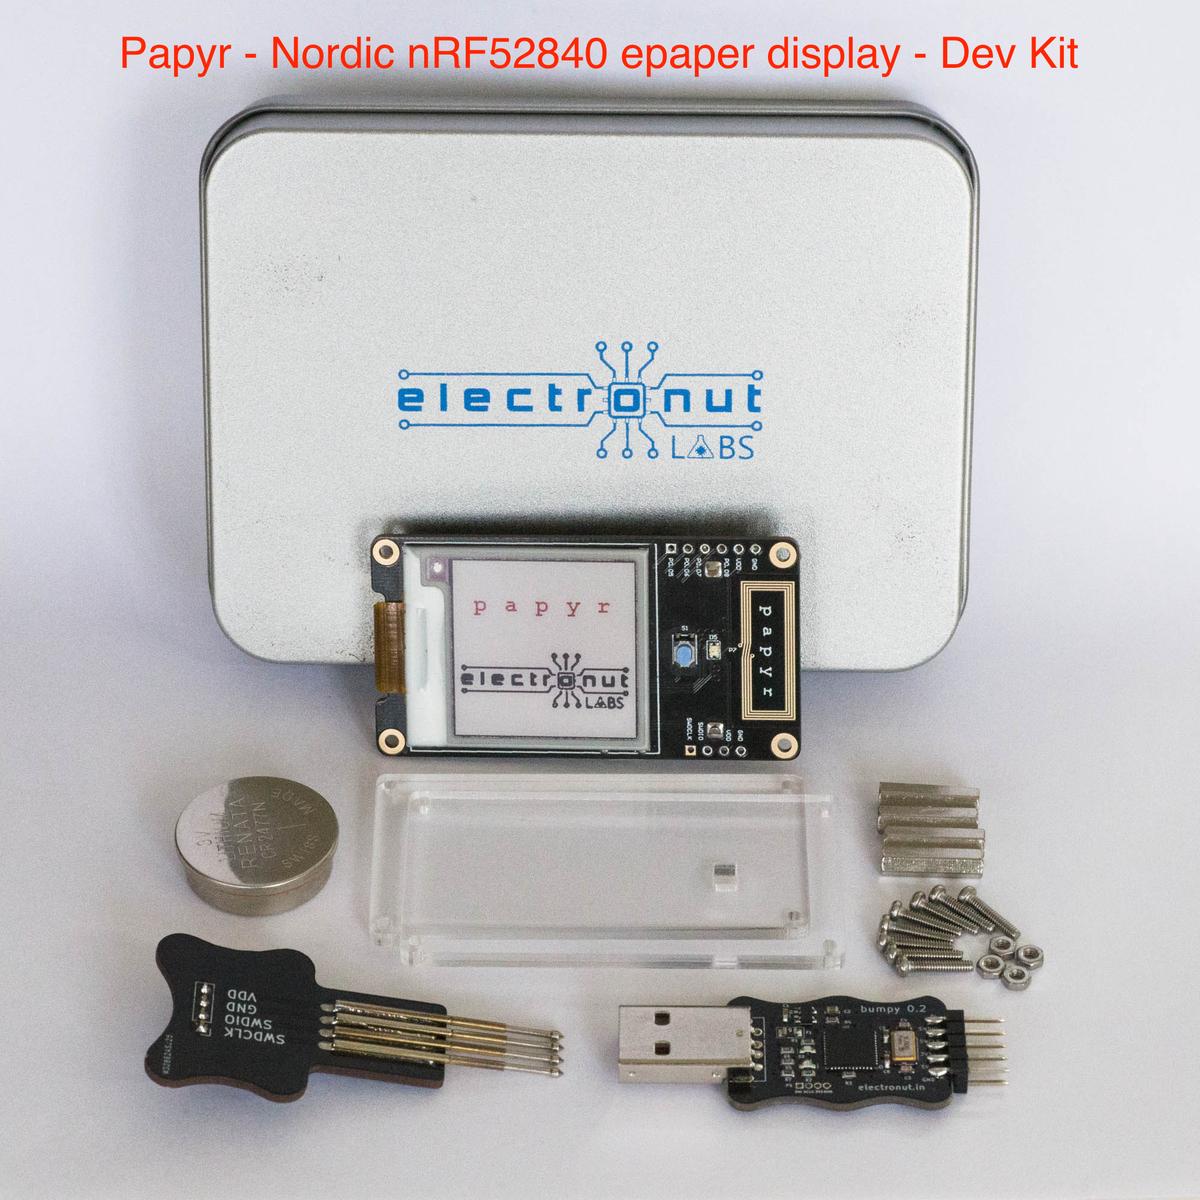 Papyr Dev Kit - Nordic nRF52840 epaper display from